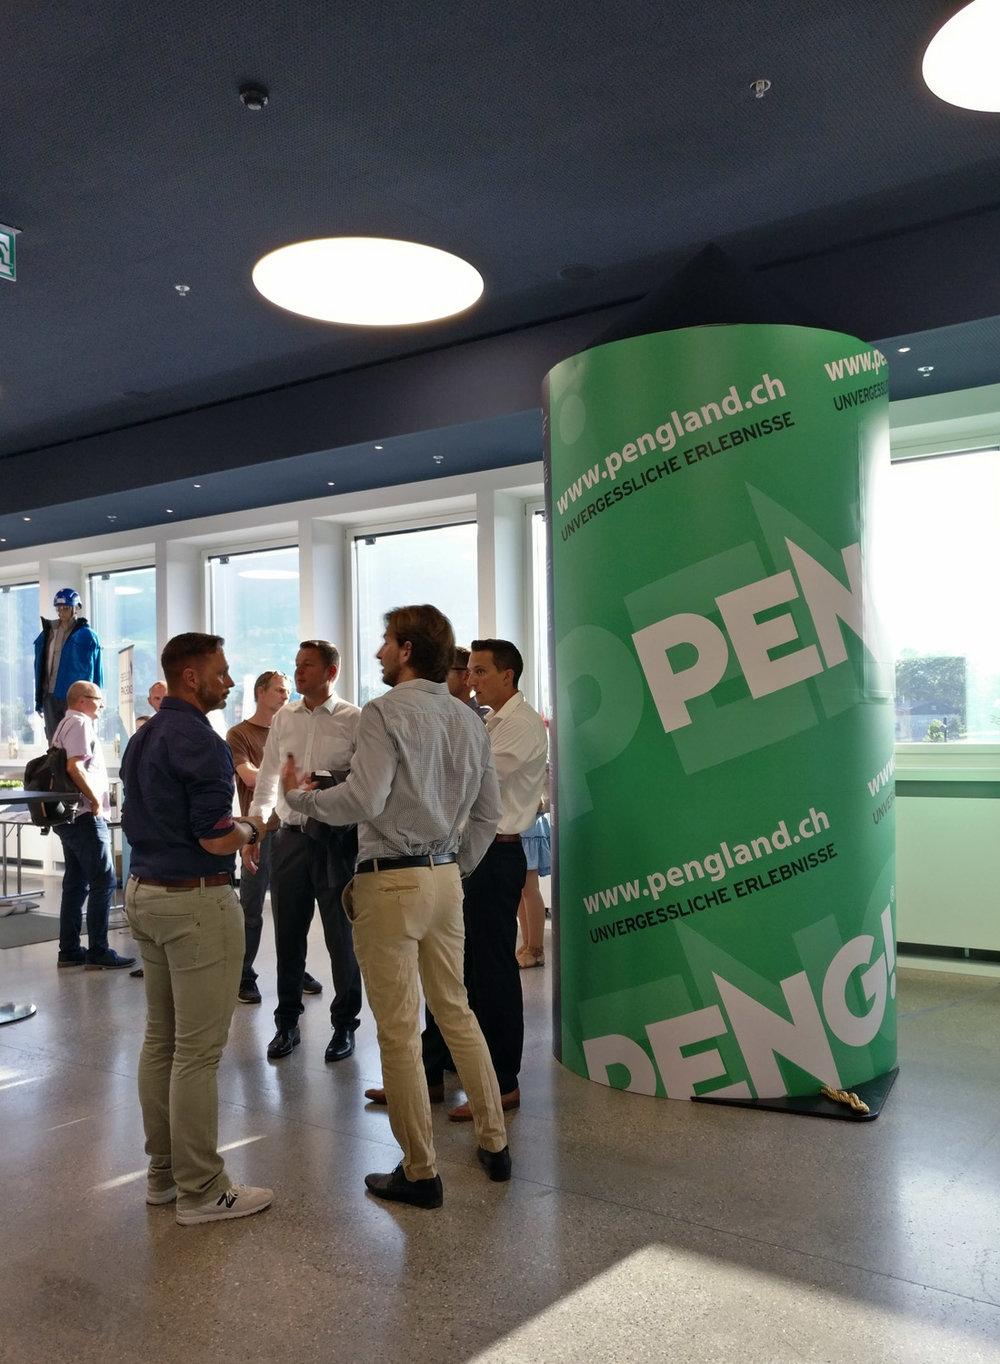 PENGland-AG_Nomination-Neuunternehmerpreis-2017_web5.jpg